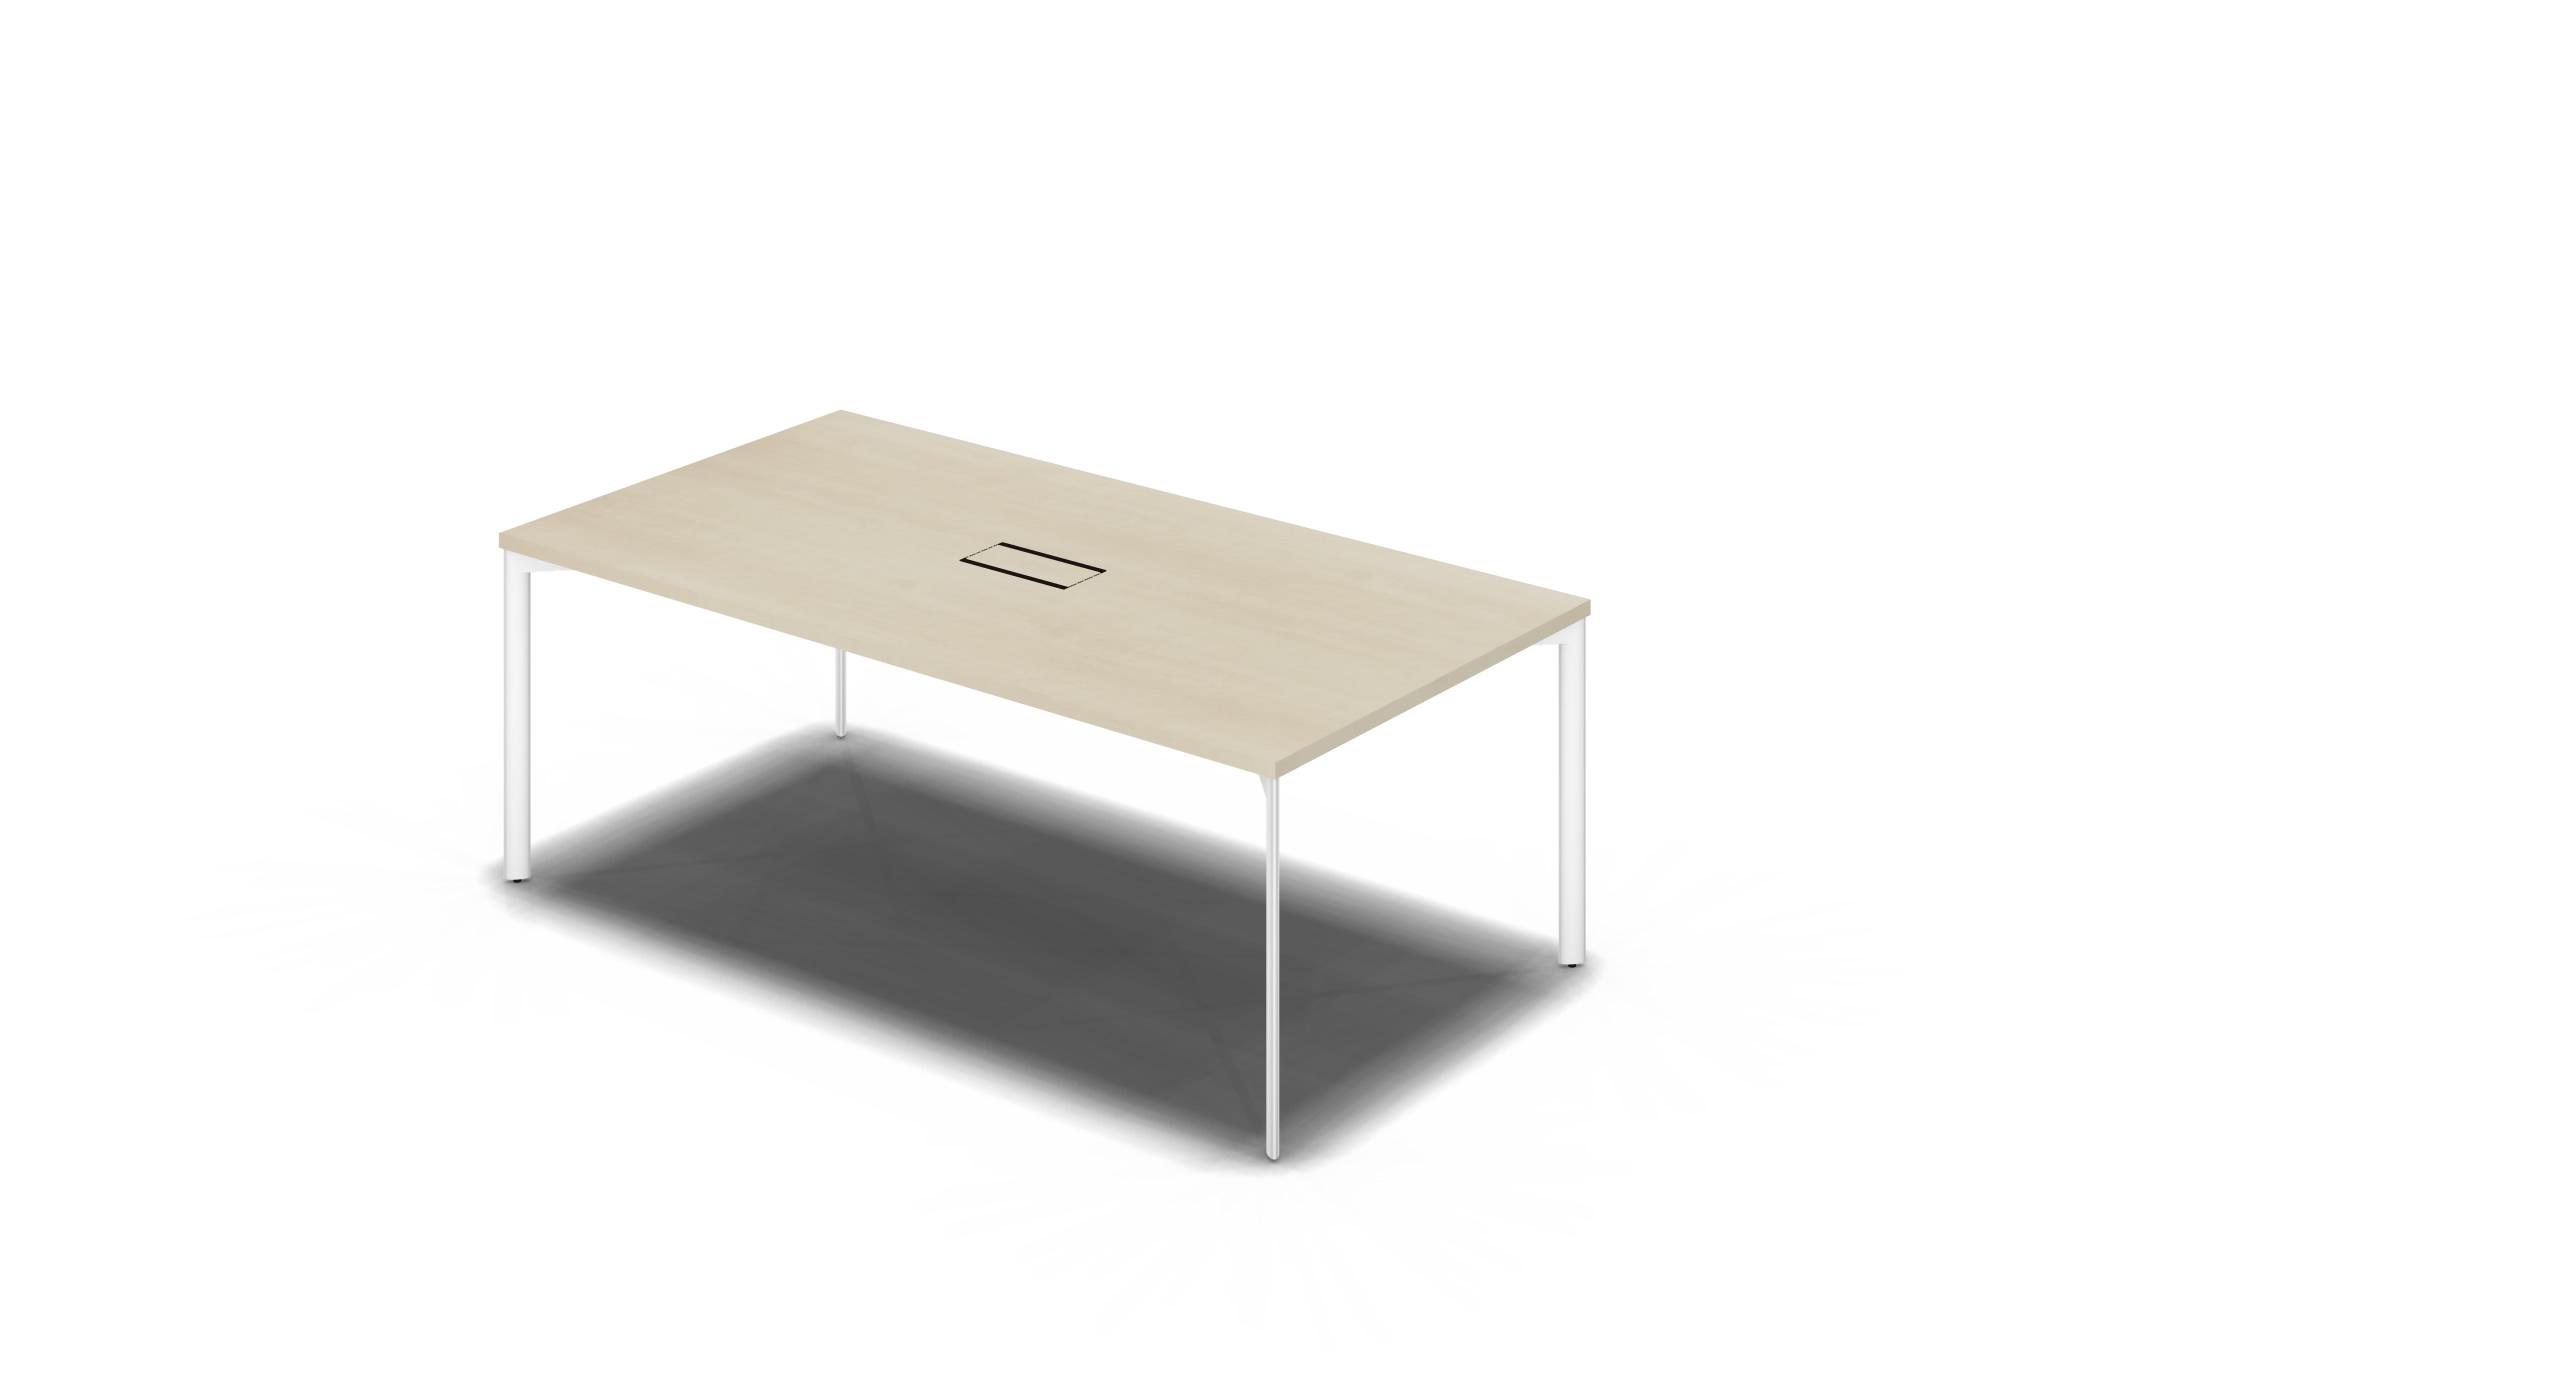 Table_Slim_1800x900_White_Maple_withOption